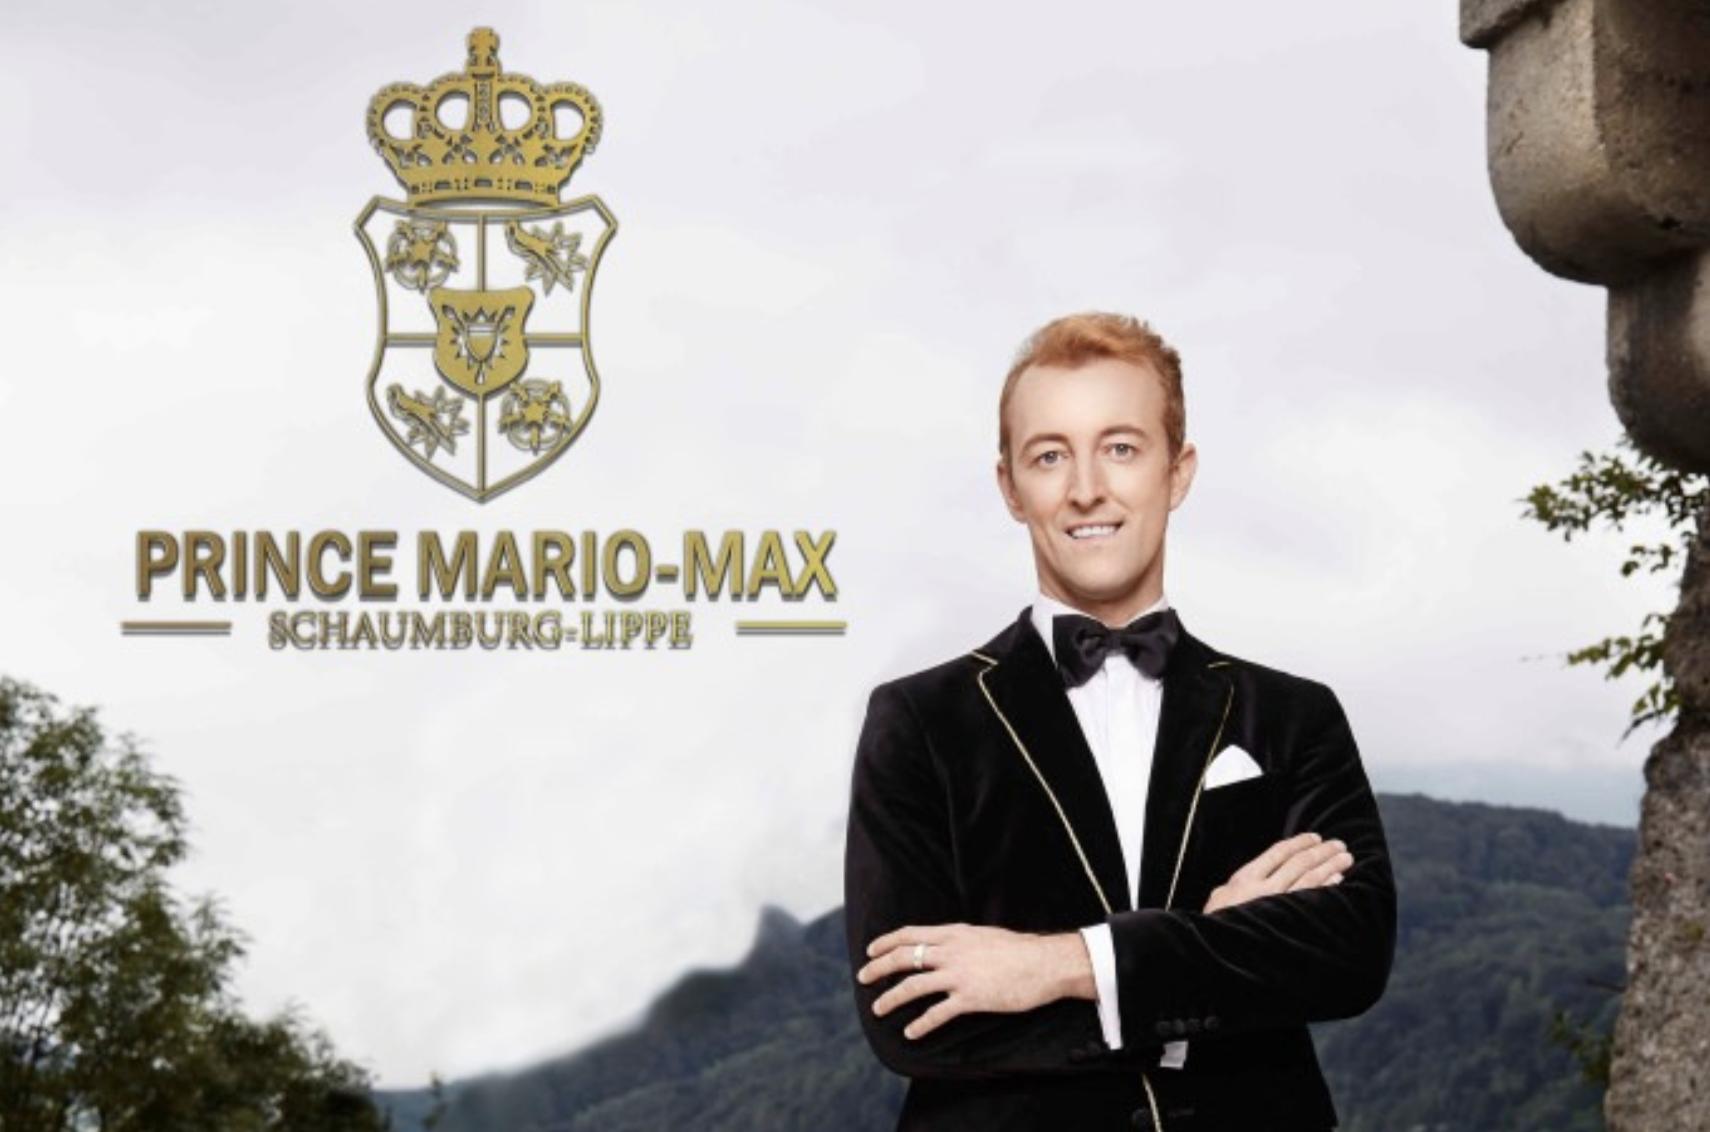 Prinz Mario-Max Schaumburg-Lippe auf RTL 2 Promis auf Hartz IV TV-Show